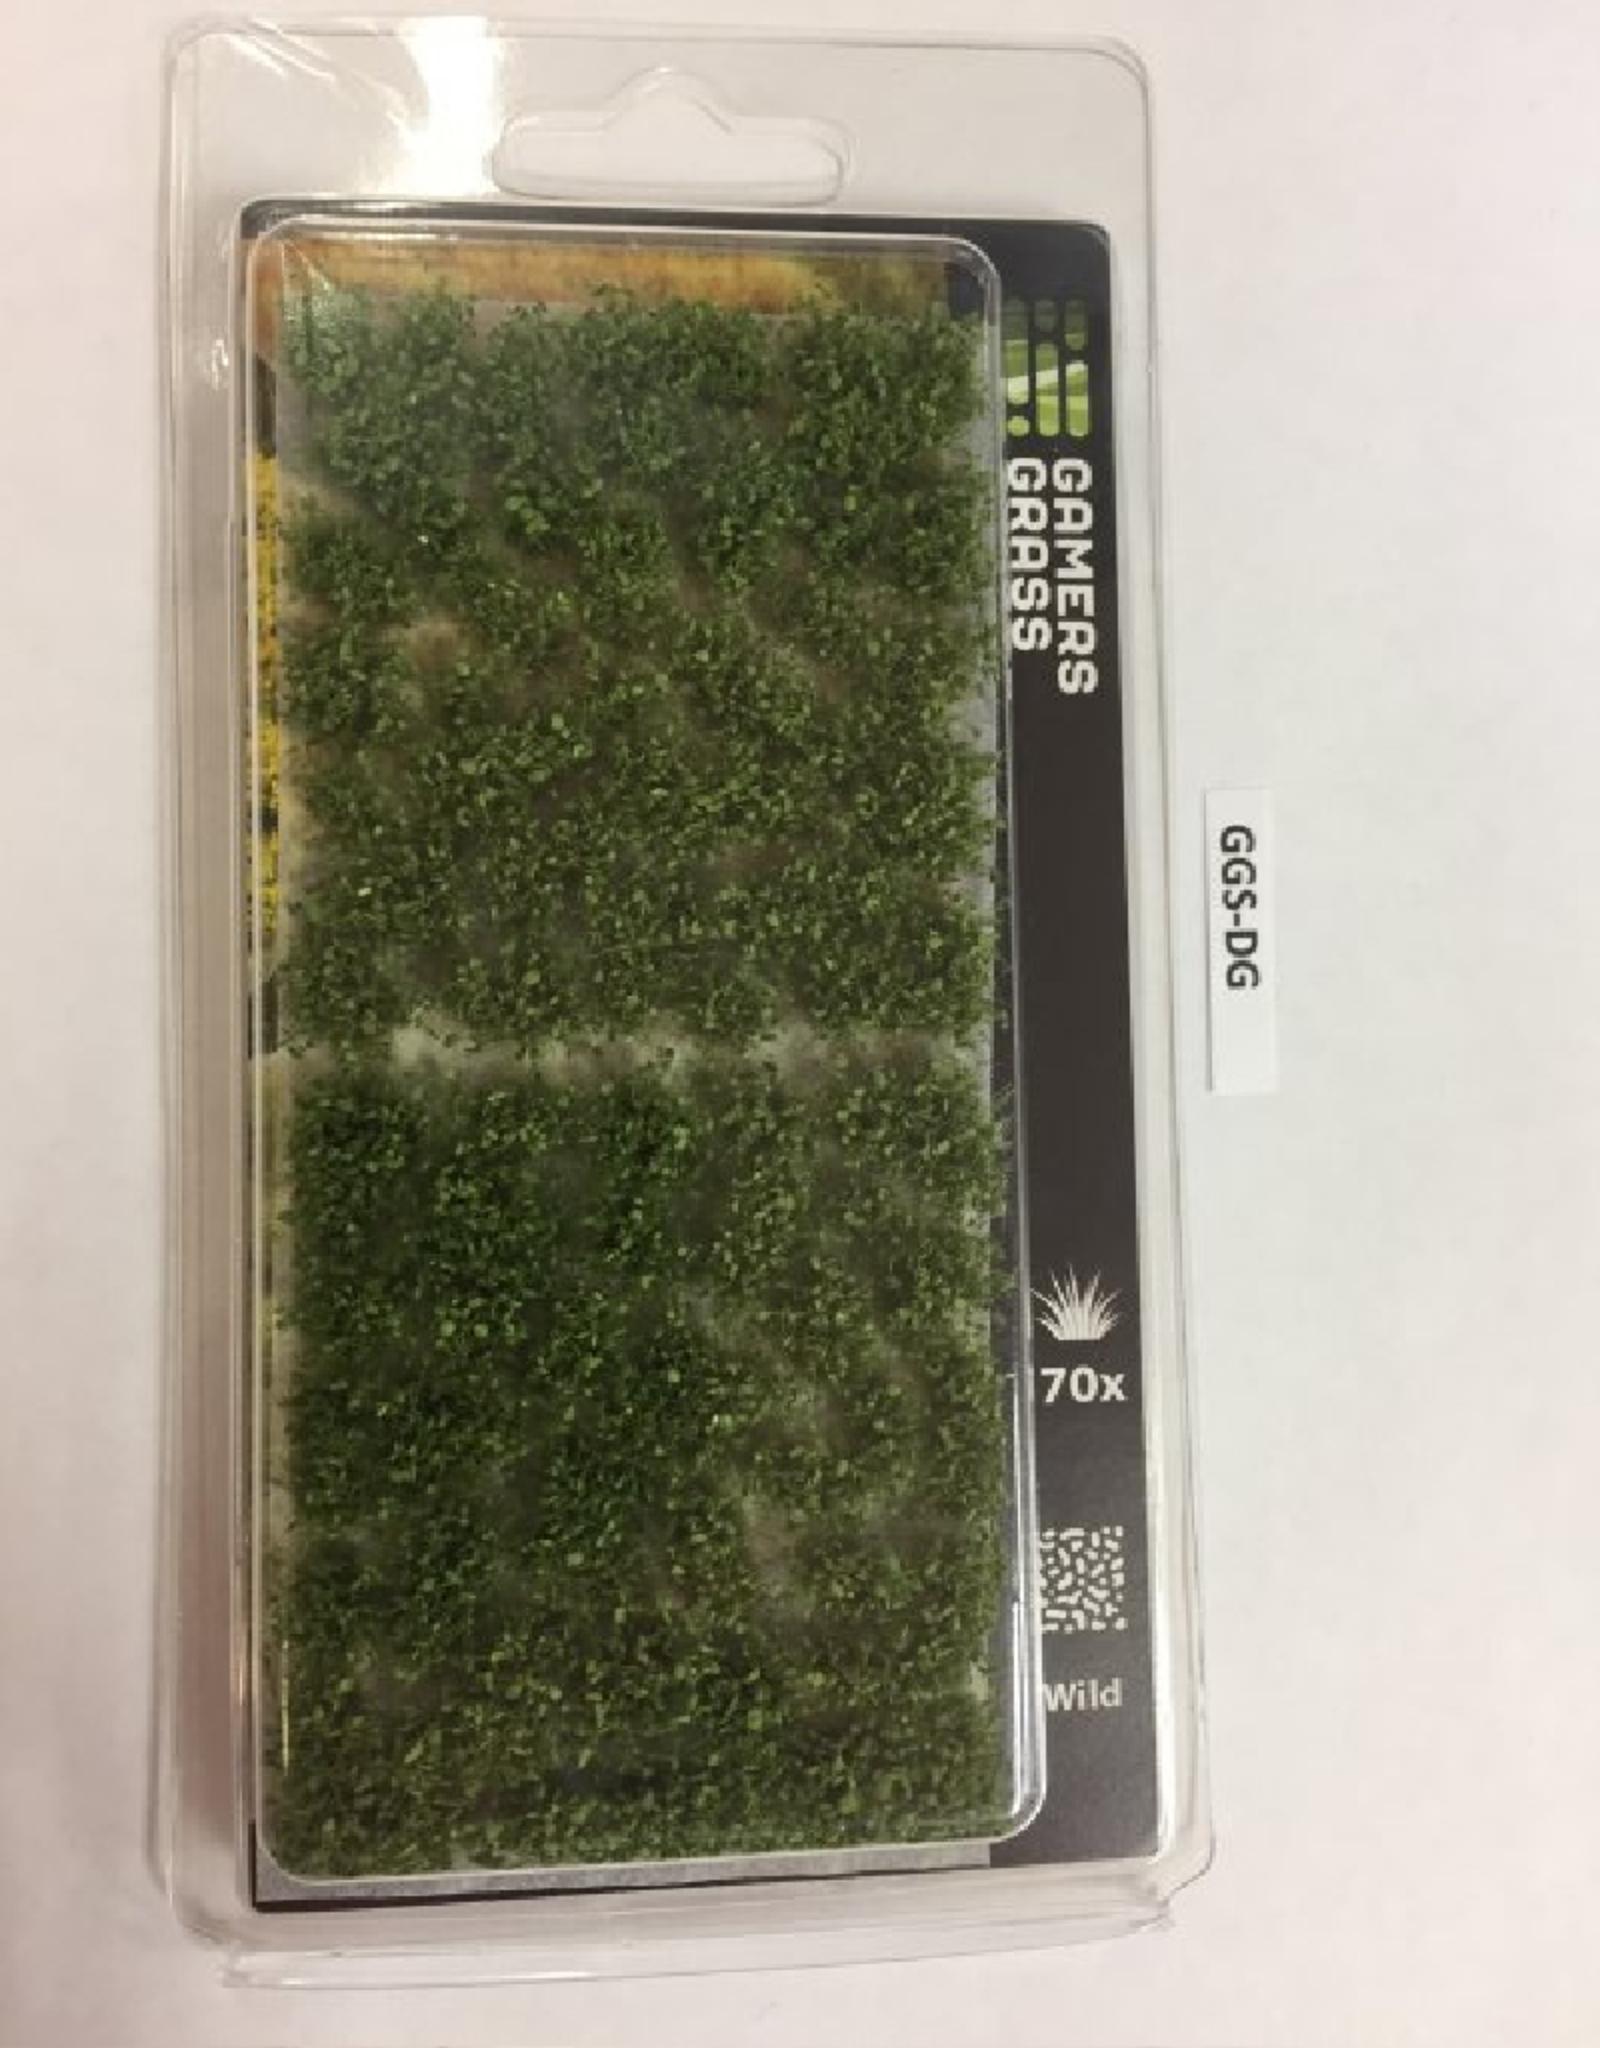 Gamers' Grass Dark Green Shrub